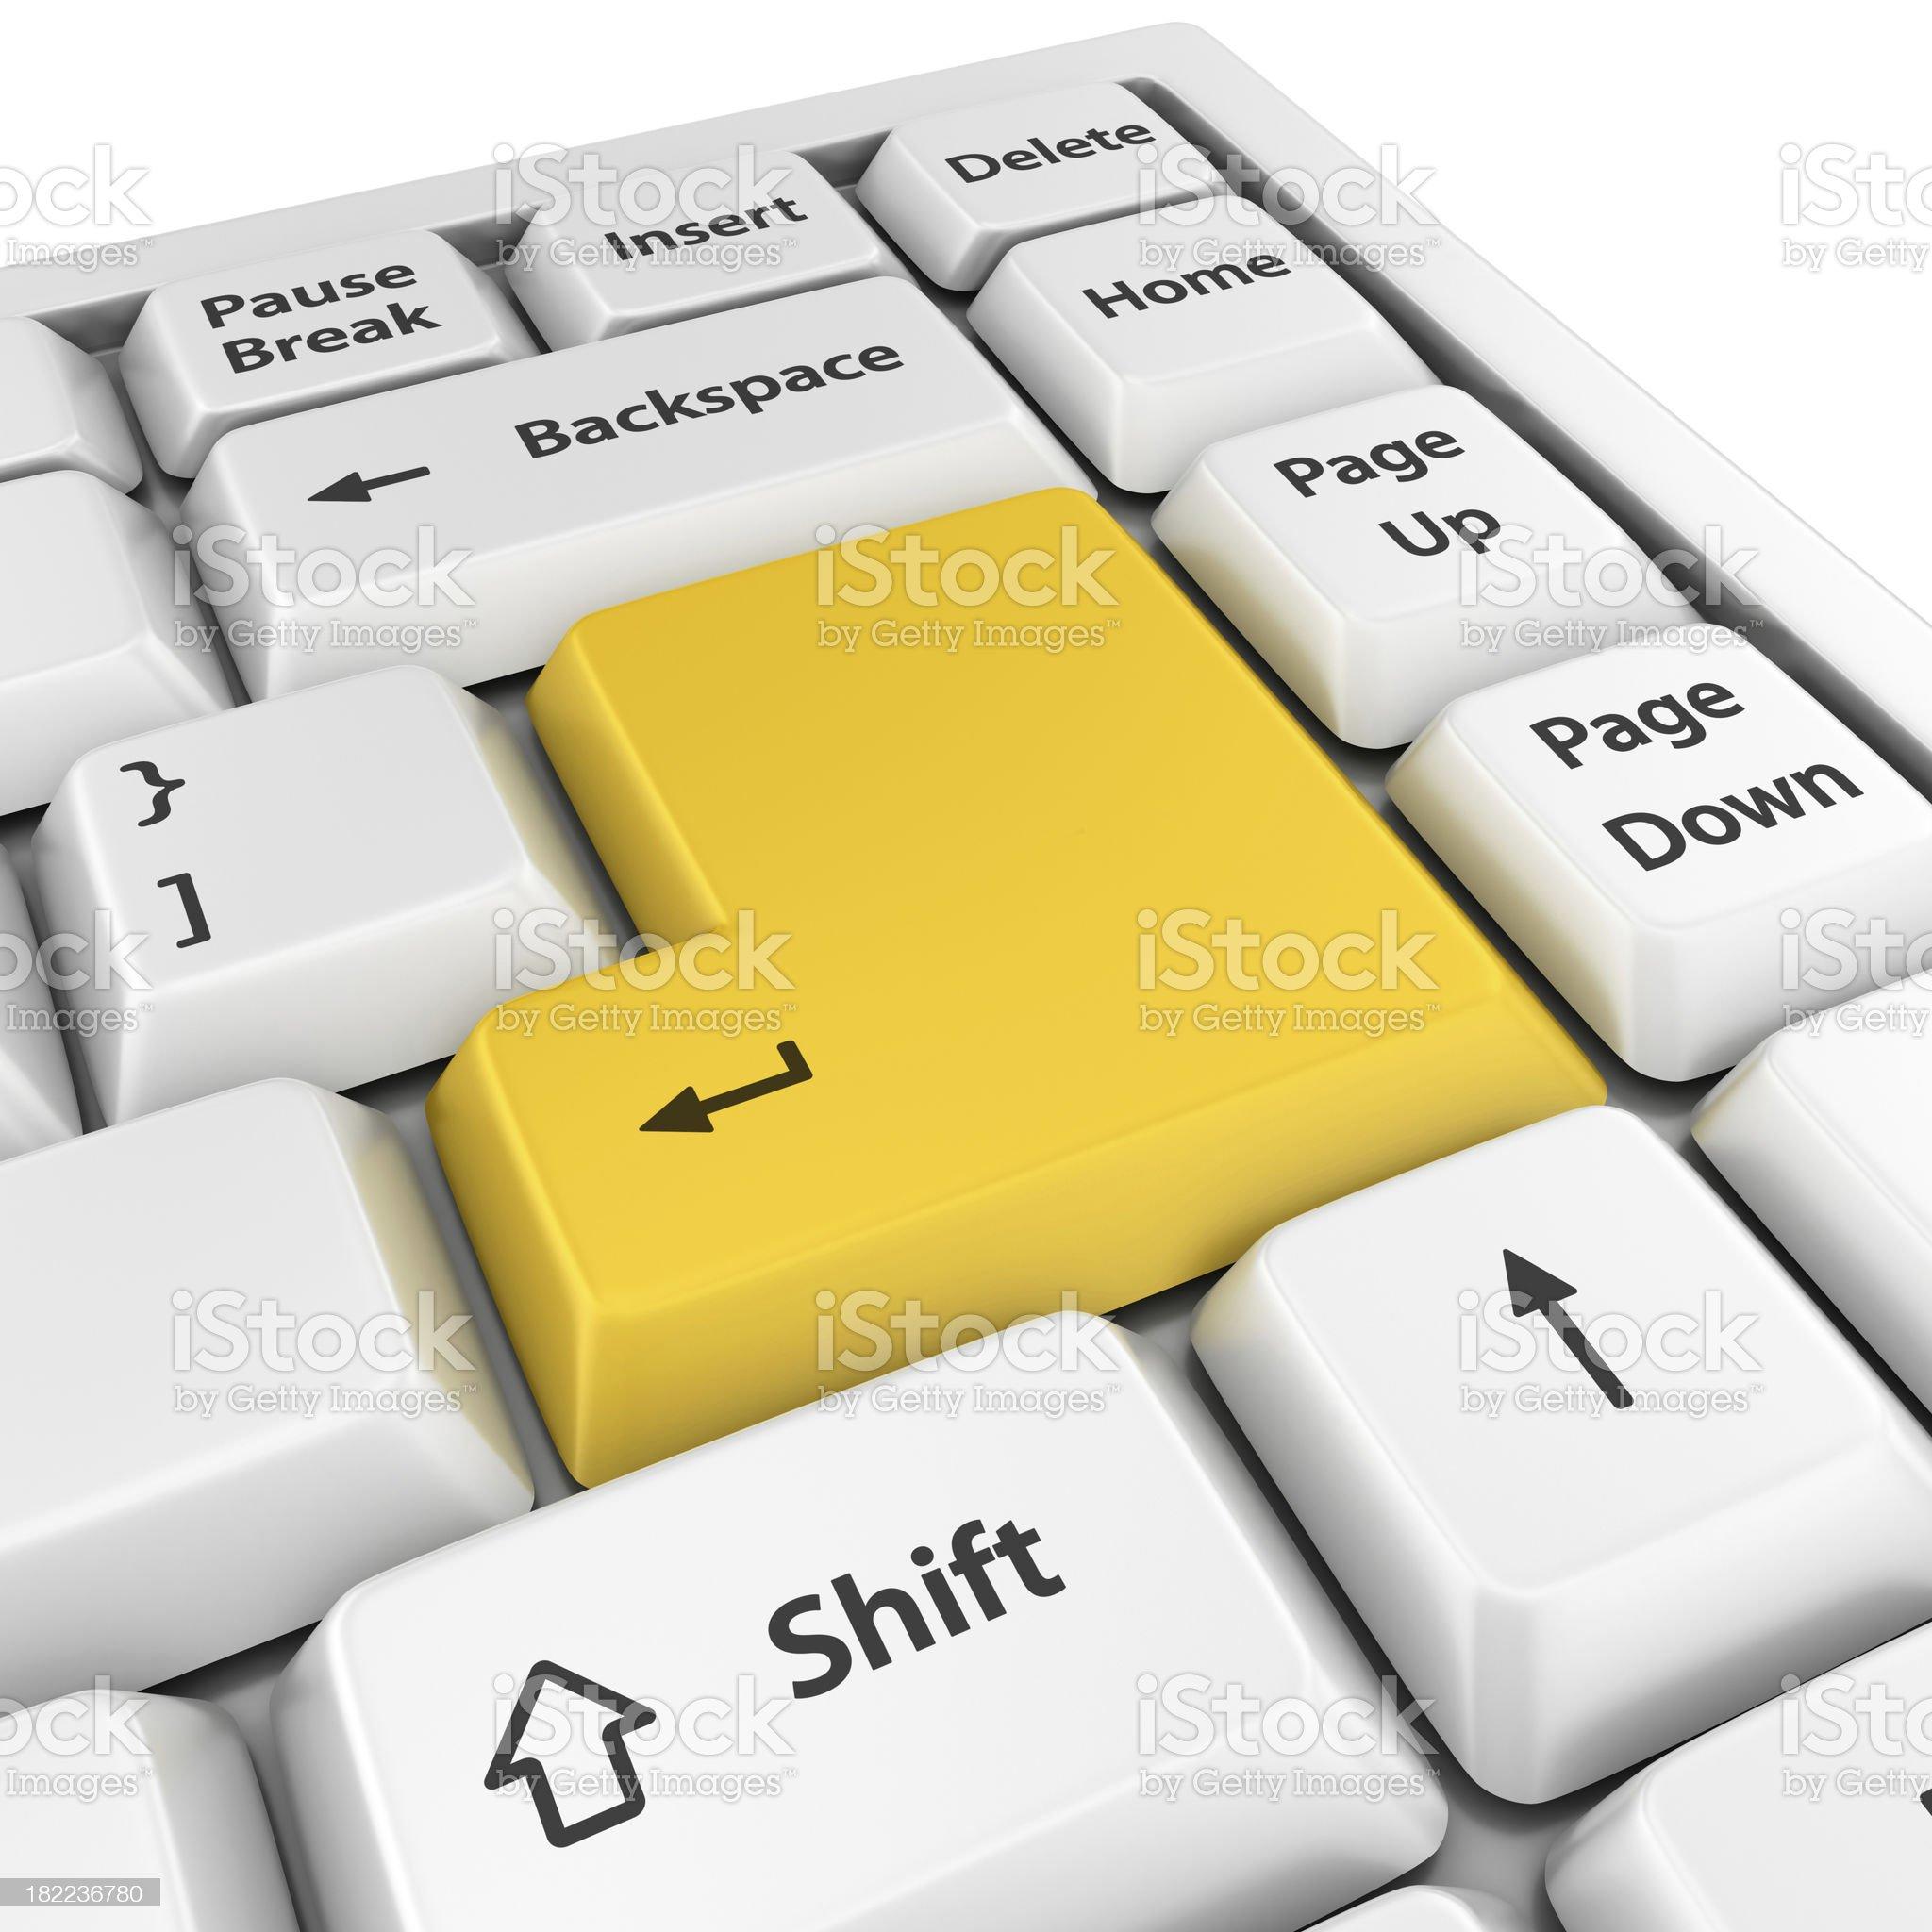 yellow blank enter button royalty-free stock photo